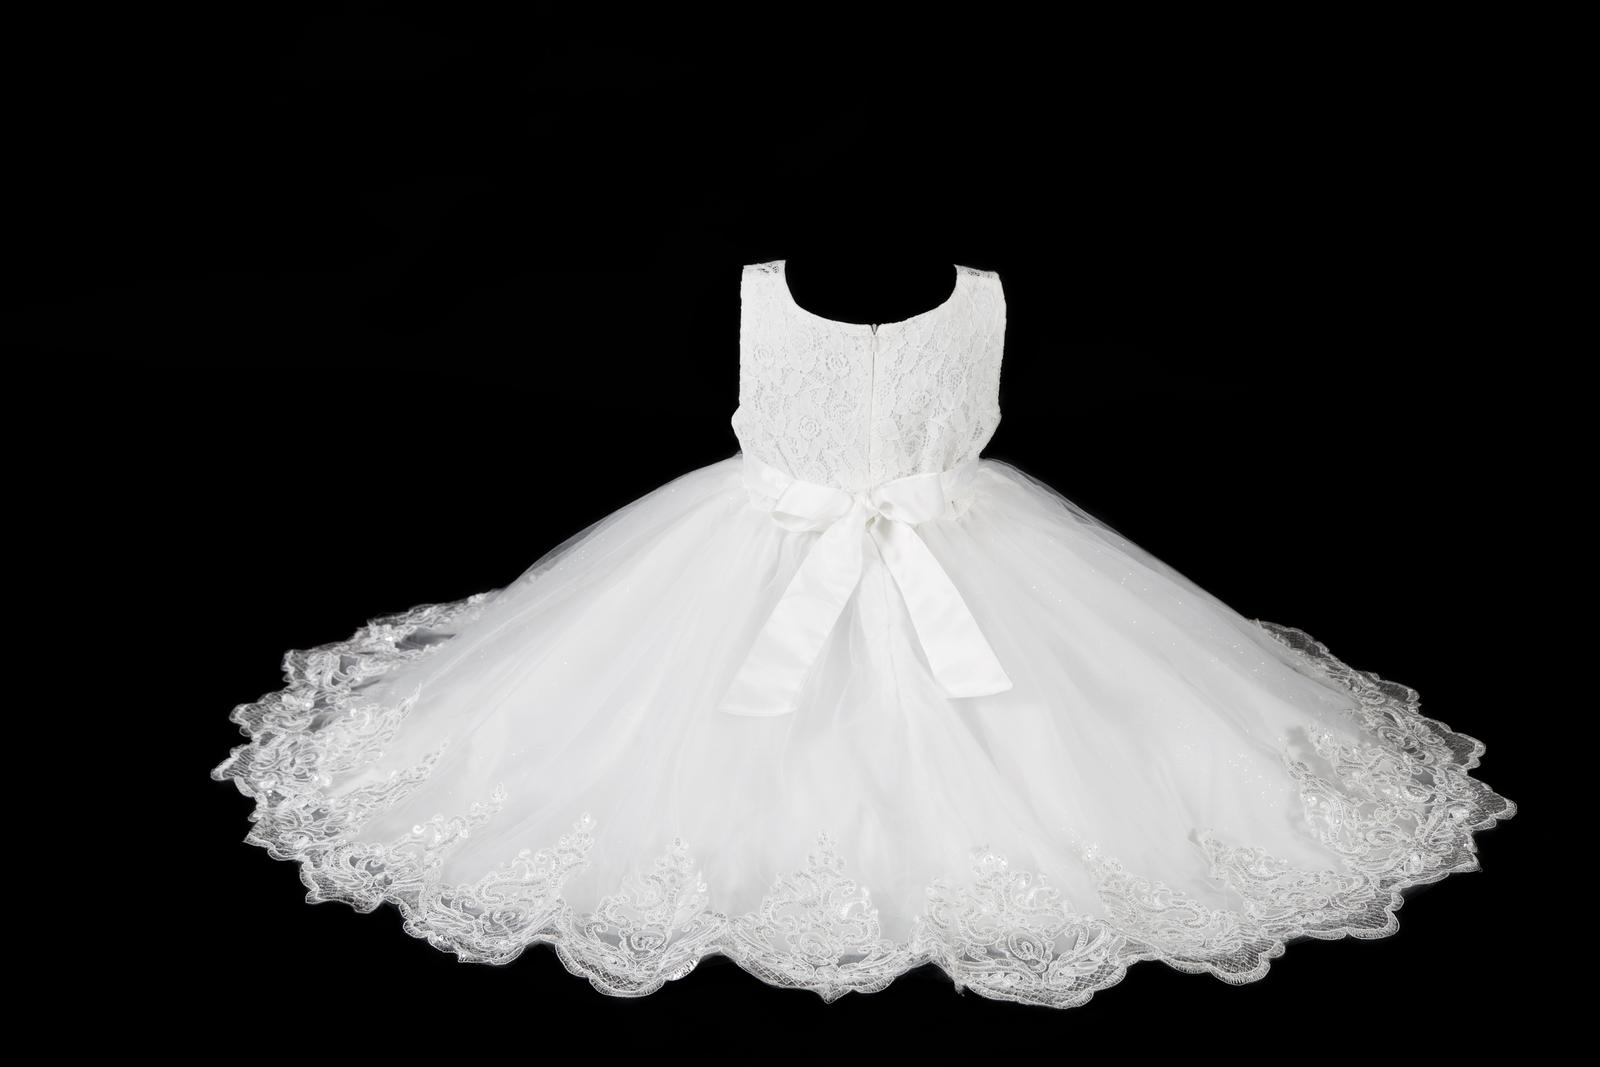 Šaty Isabel - Obrázek č. 3